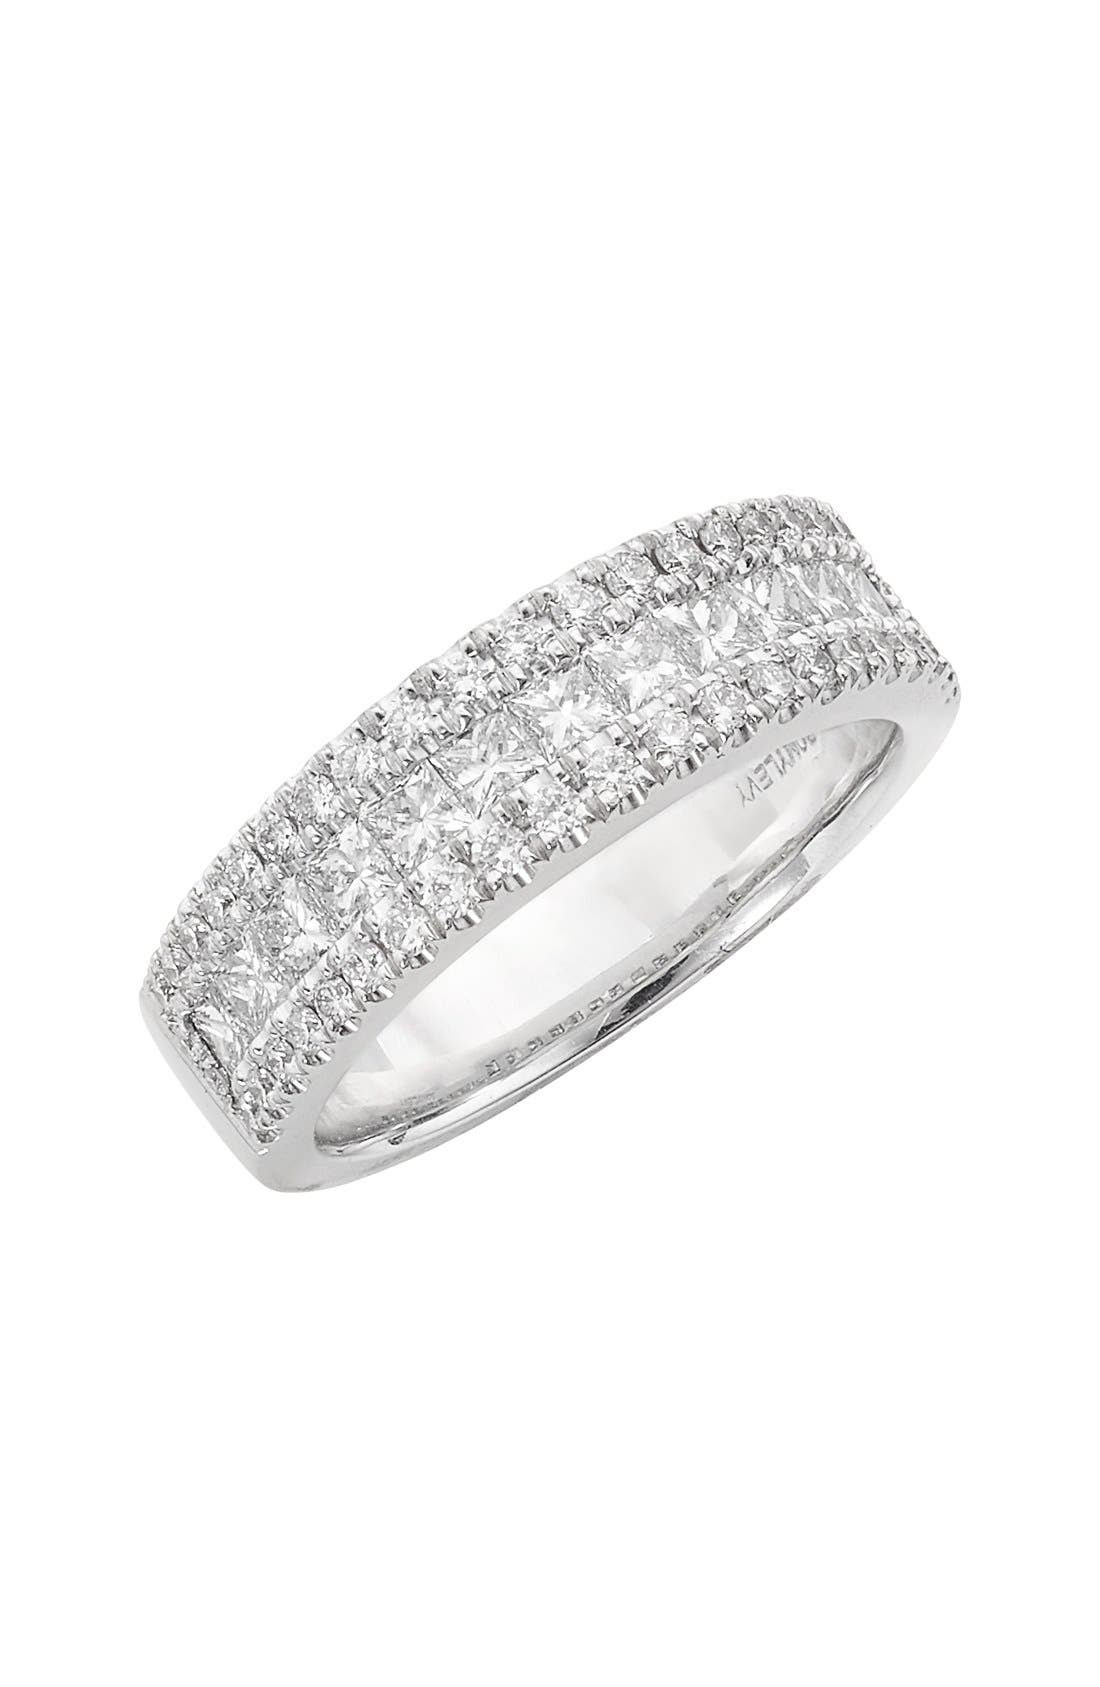 Main Image - Bony Levy 'Liora' Princess Diamond Ring (Nordstrom Exclusive)